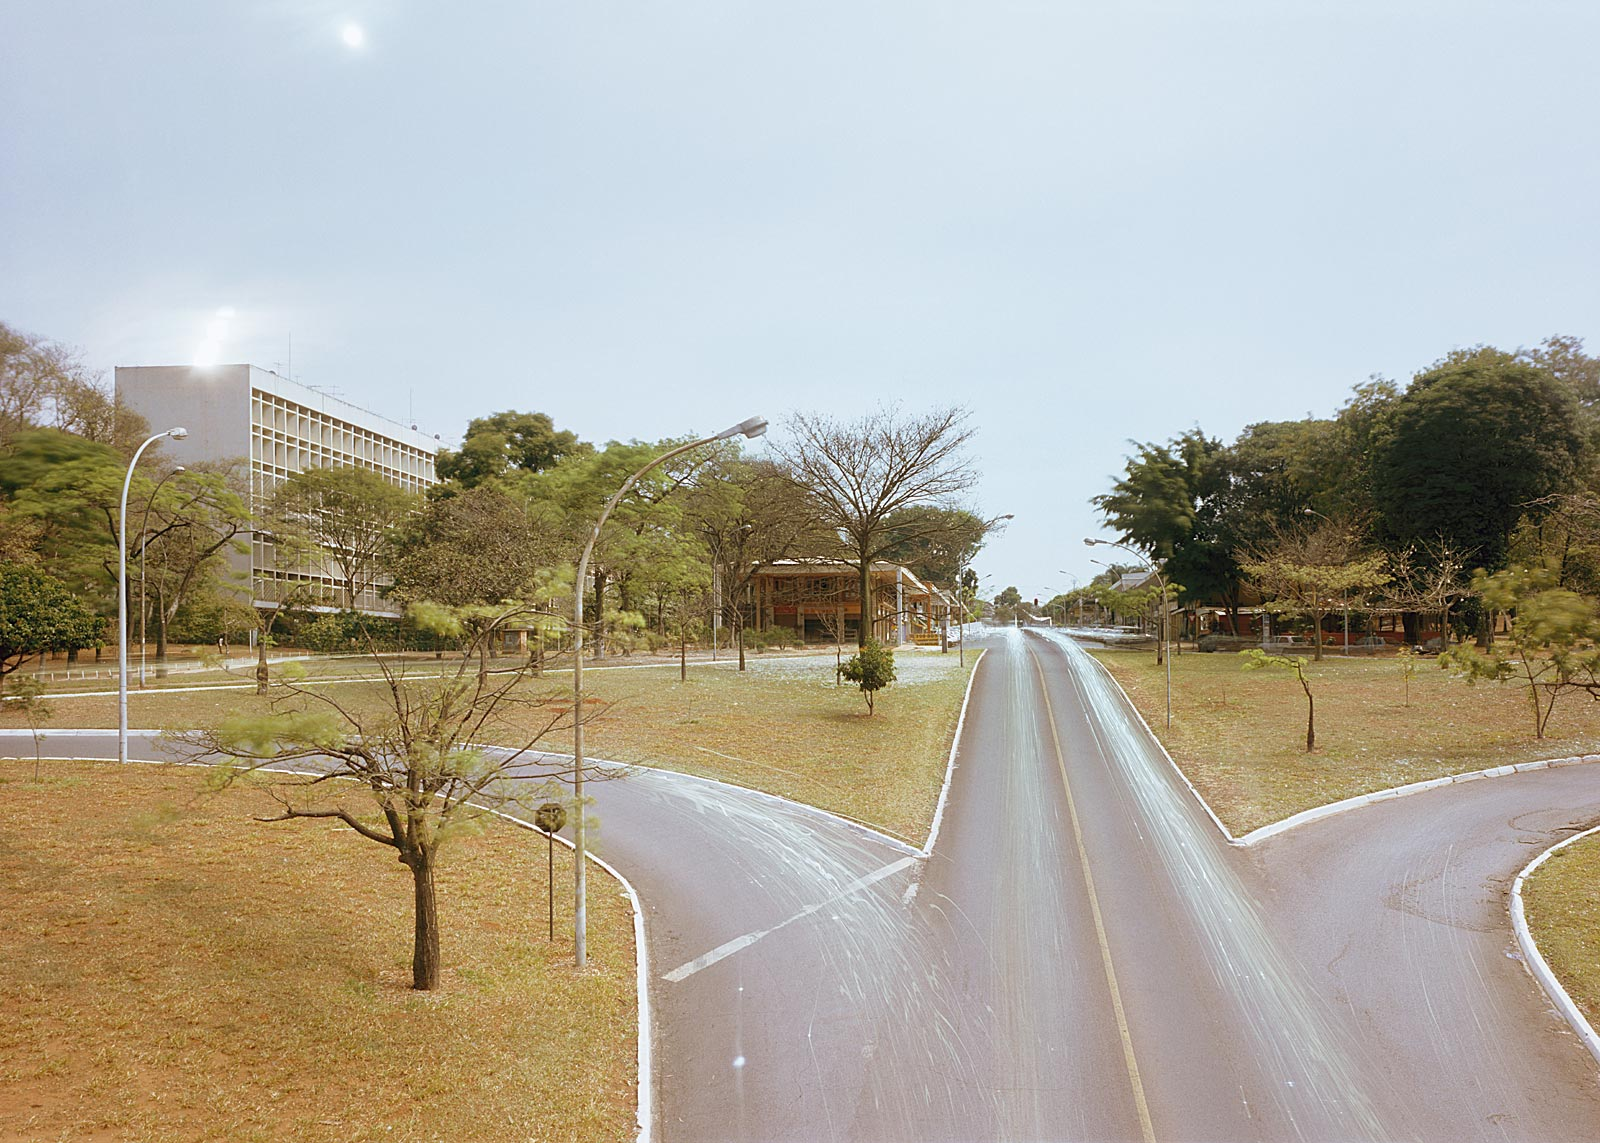 Comércio Local Sul, Brasilia